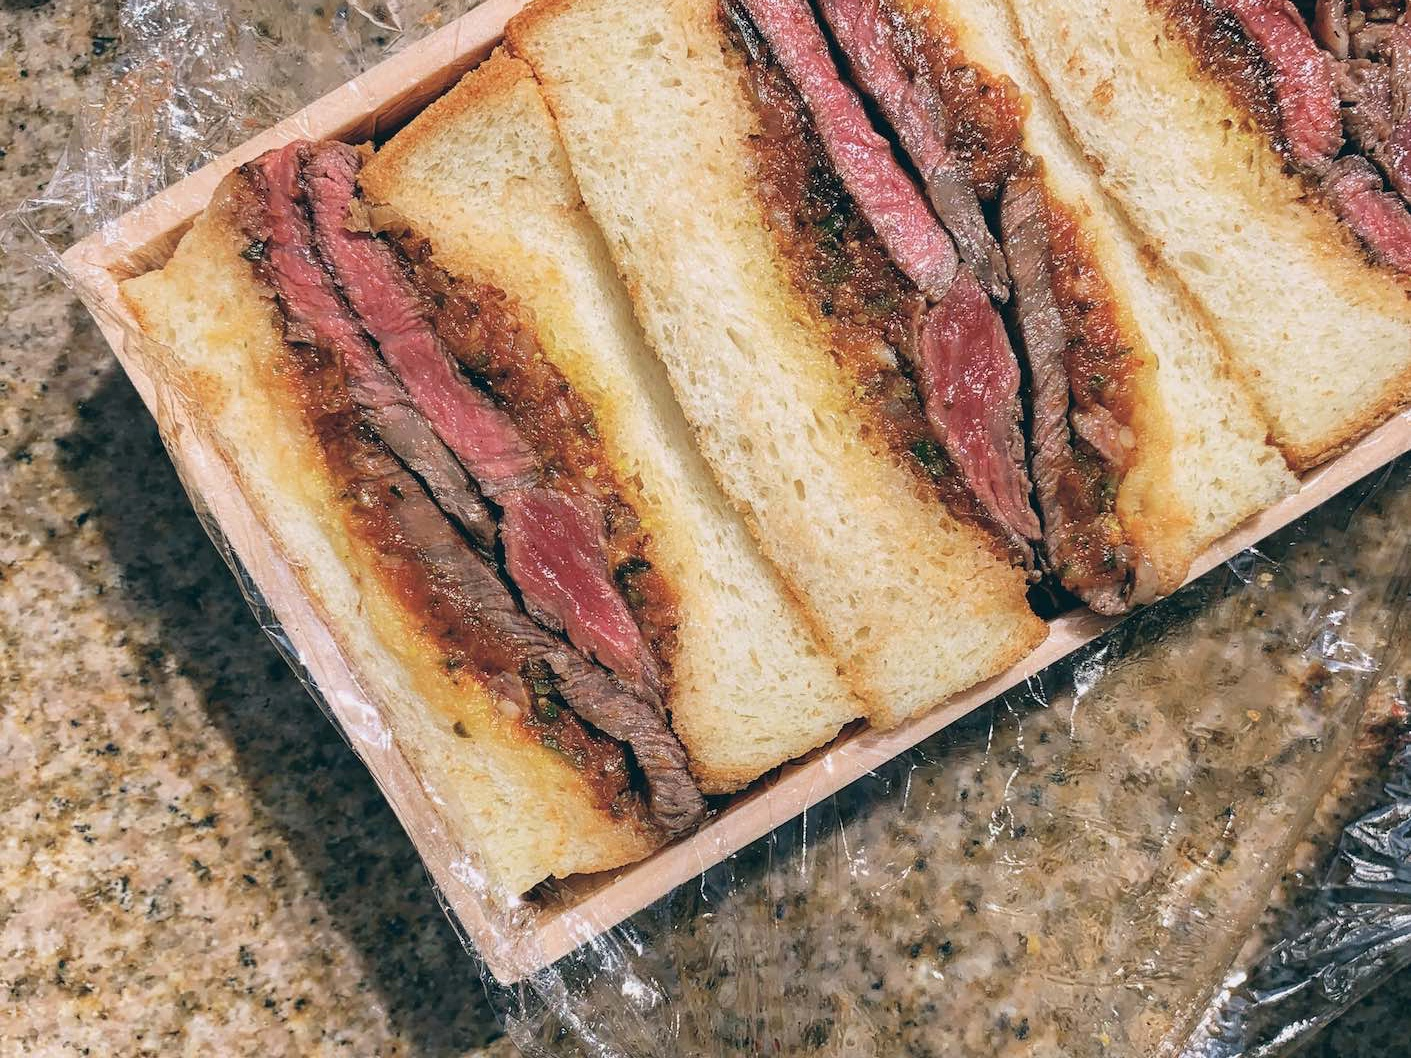 Tokyo: fine steaks and the ultimate Wagyu steak sandwich at Shima